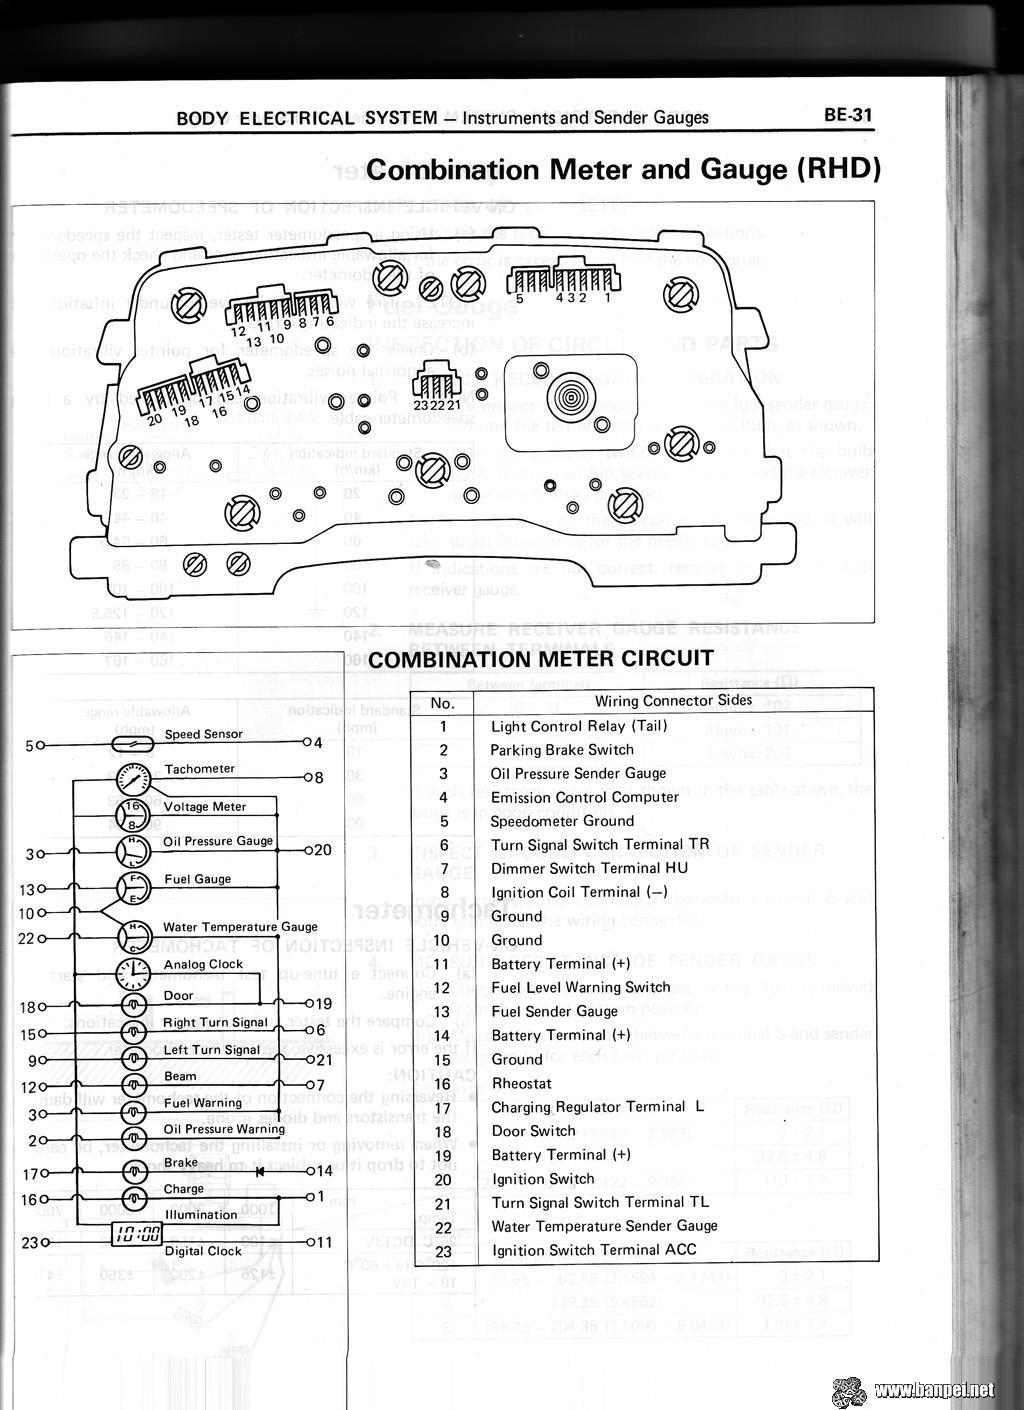 Carina RHD Cluster layout